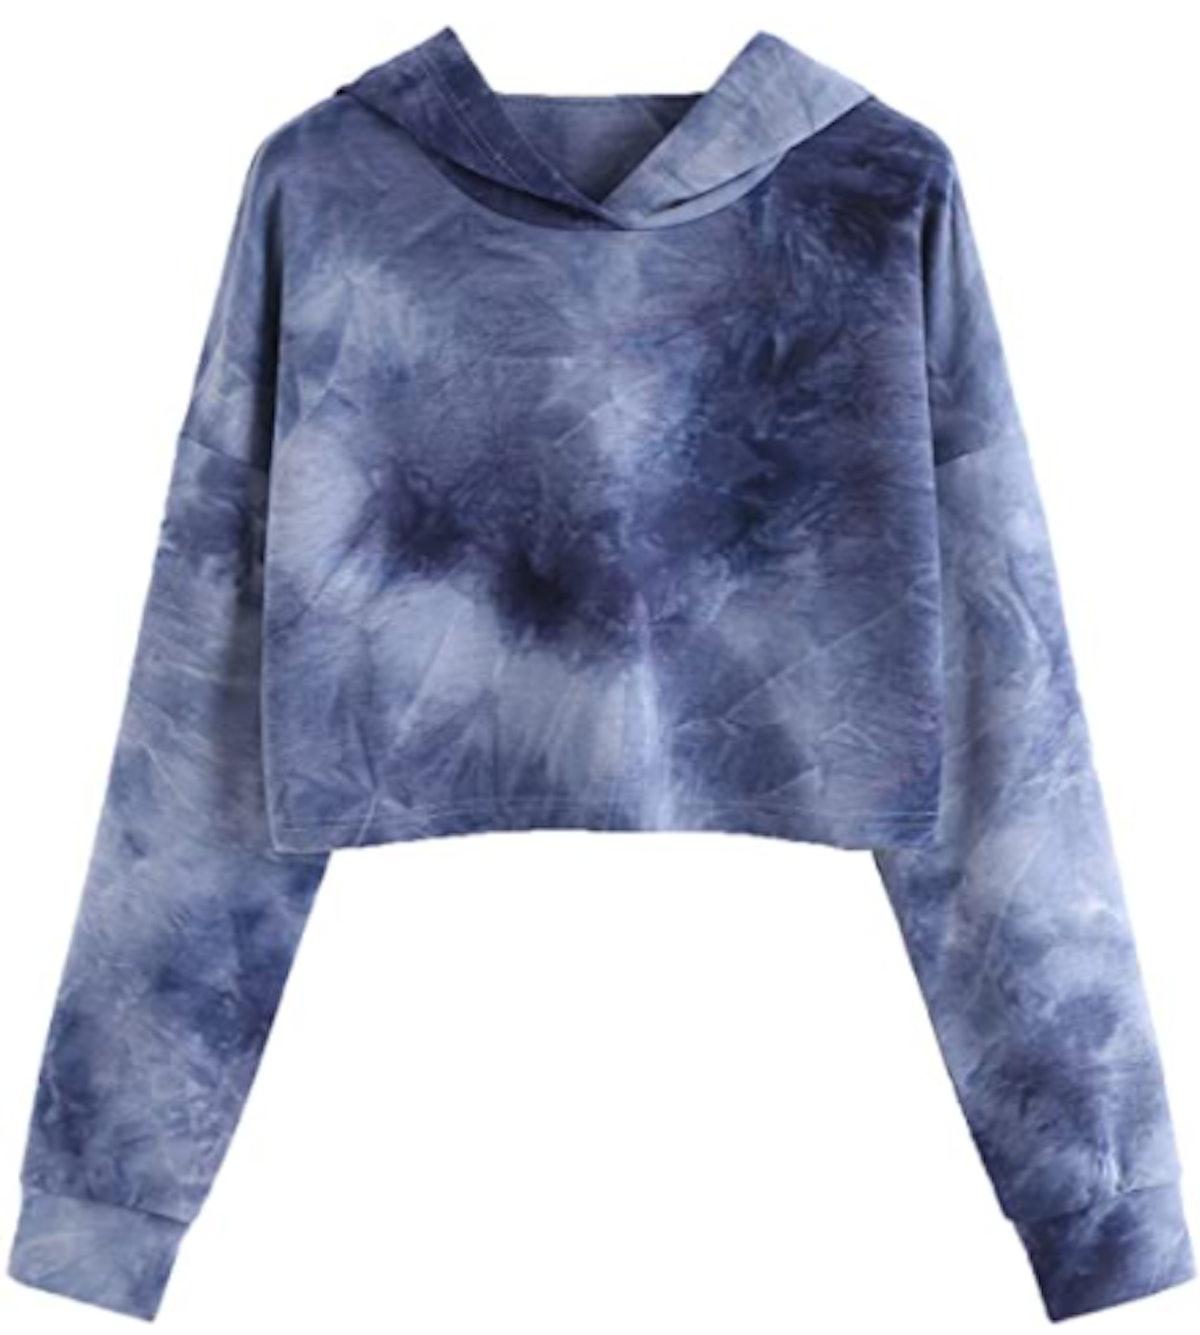 SweatyRocks Crop Top Sweatshirt